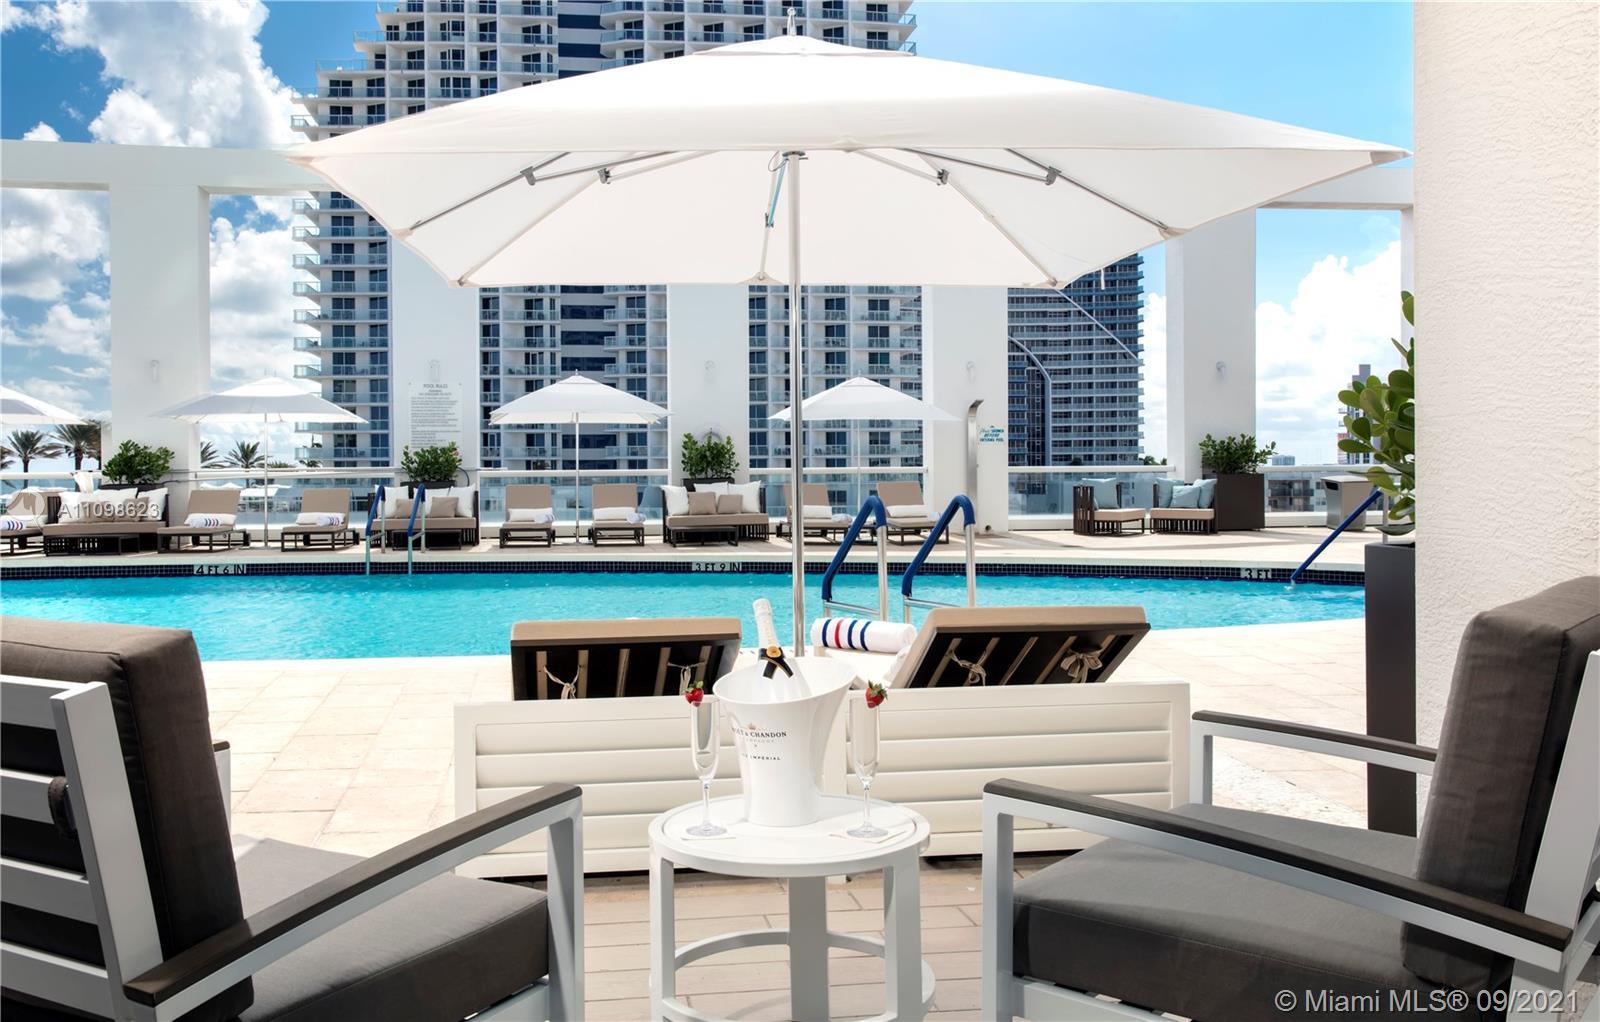 551 N Fort Lauderdale Beach Blvd #10